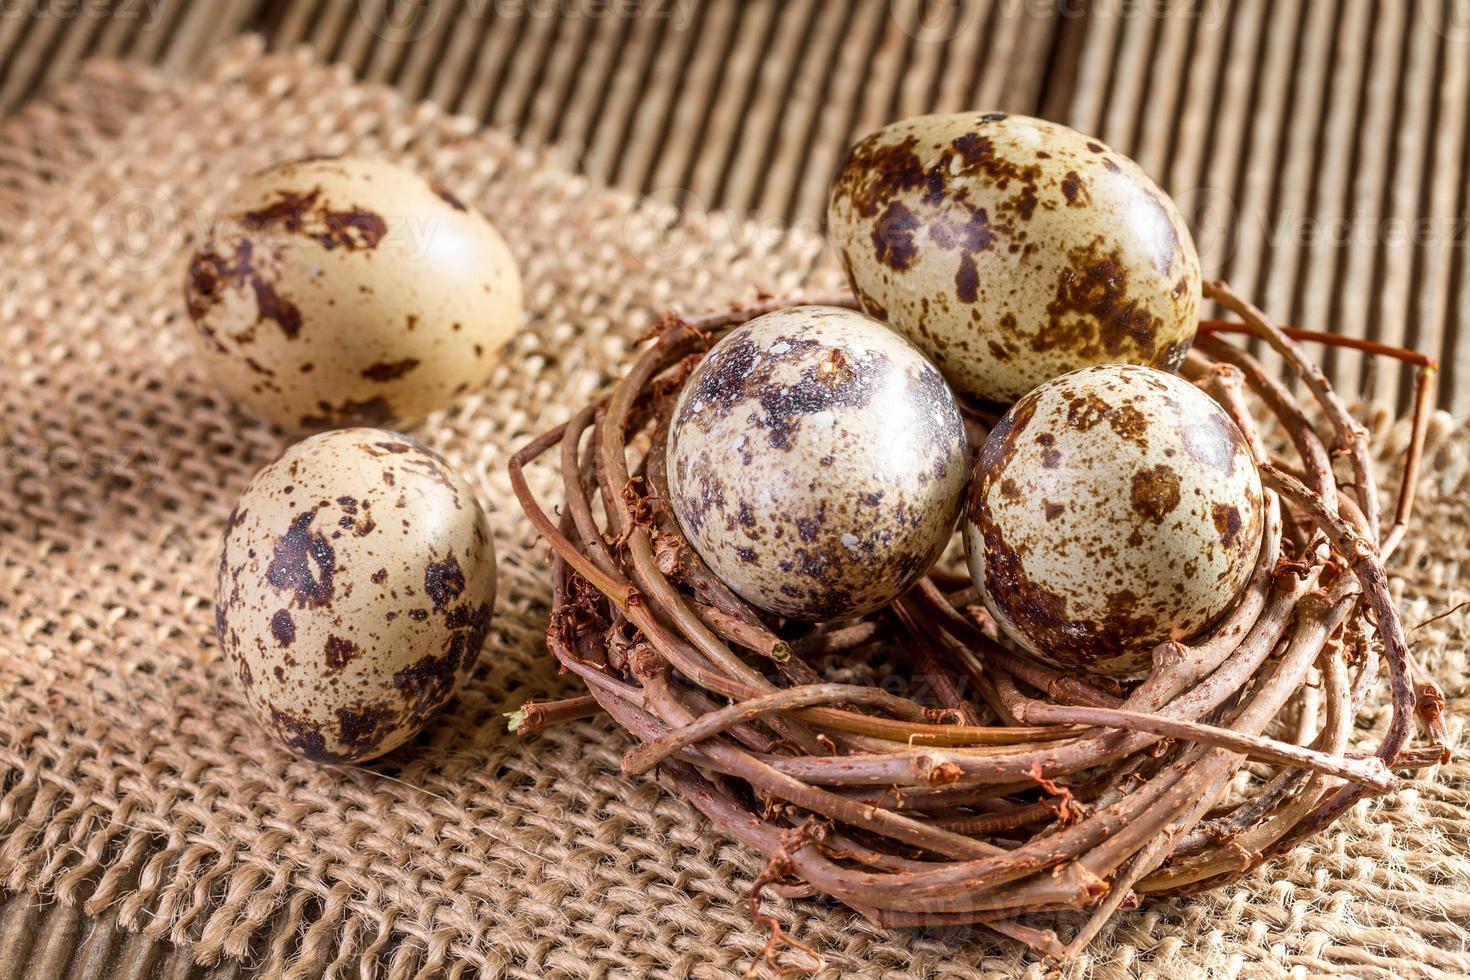 Quail eggs in the nest closeup photo